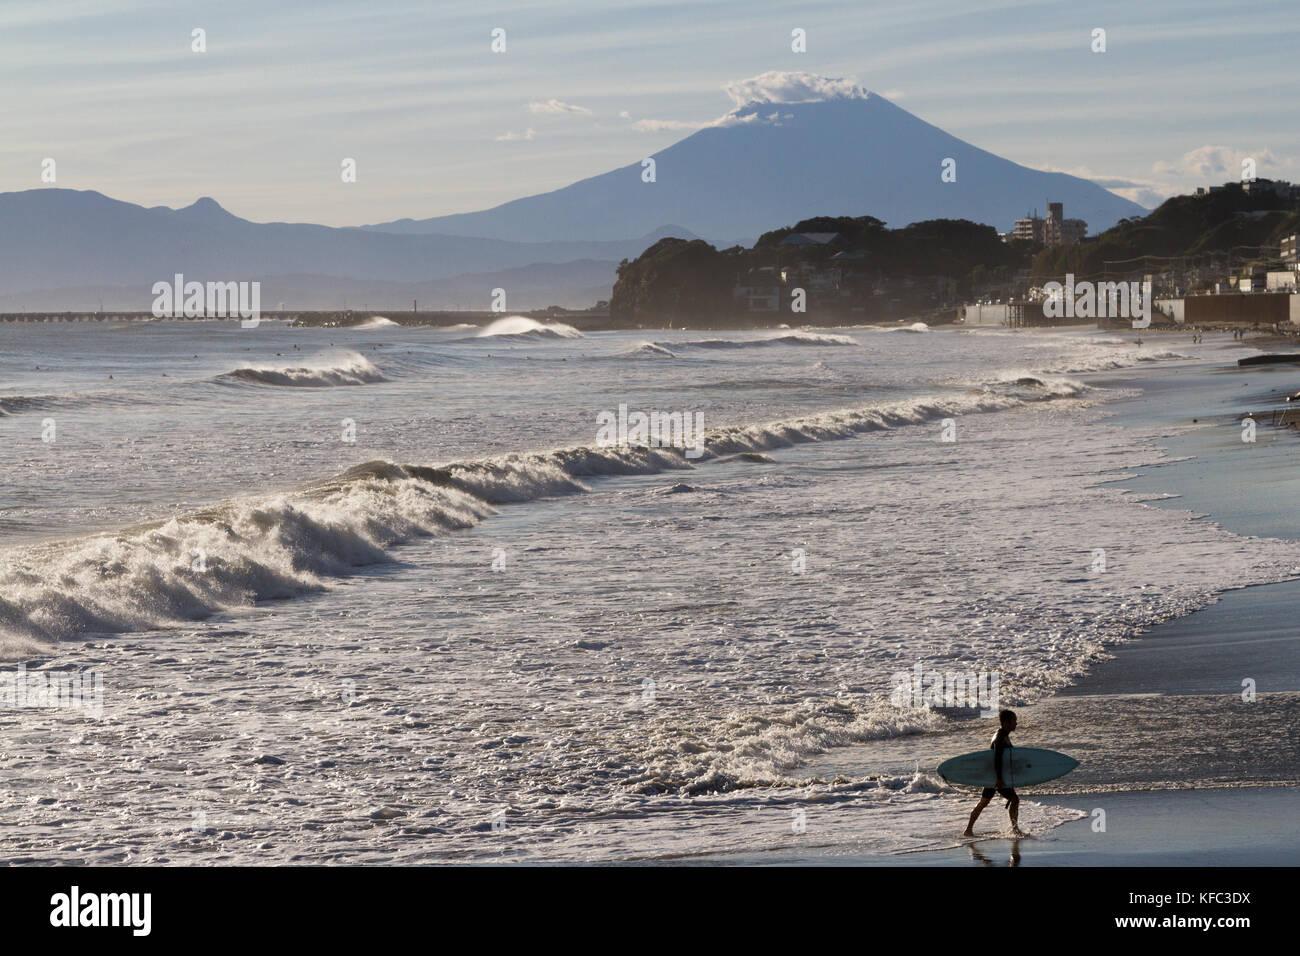 A surfer on the beach with Mount Fuji behind. Enoshima, Kanagawa, Japan. Monday October 23rd 2017 - Stock Image